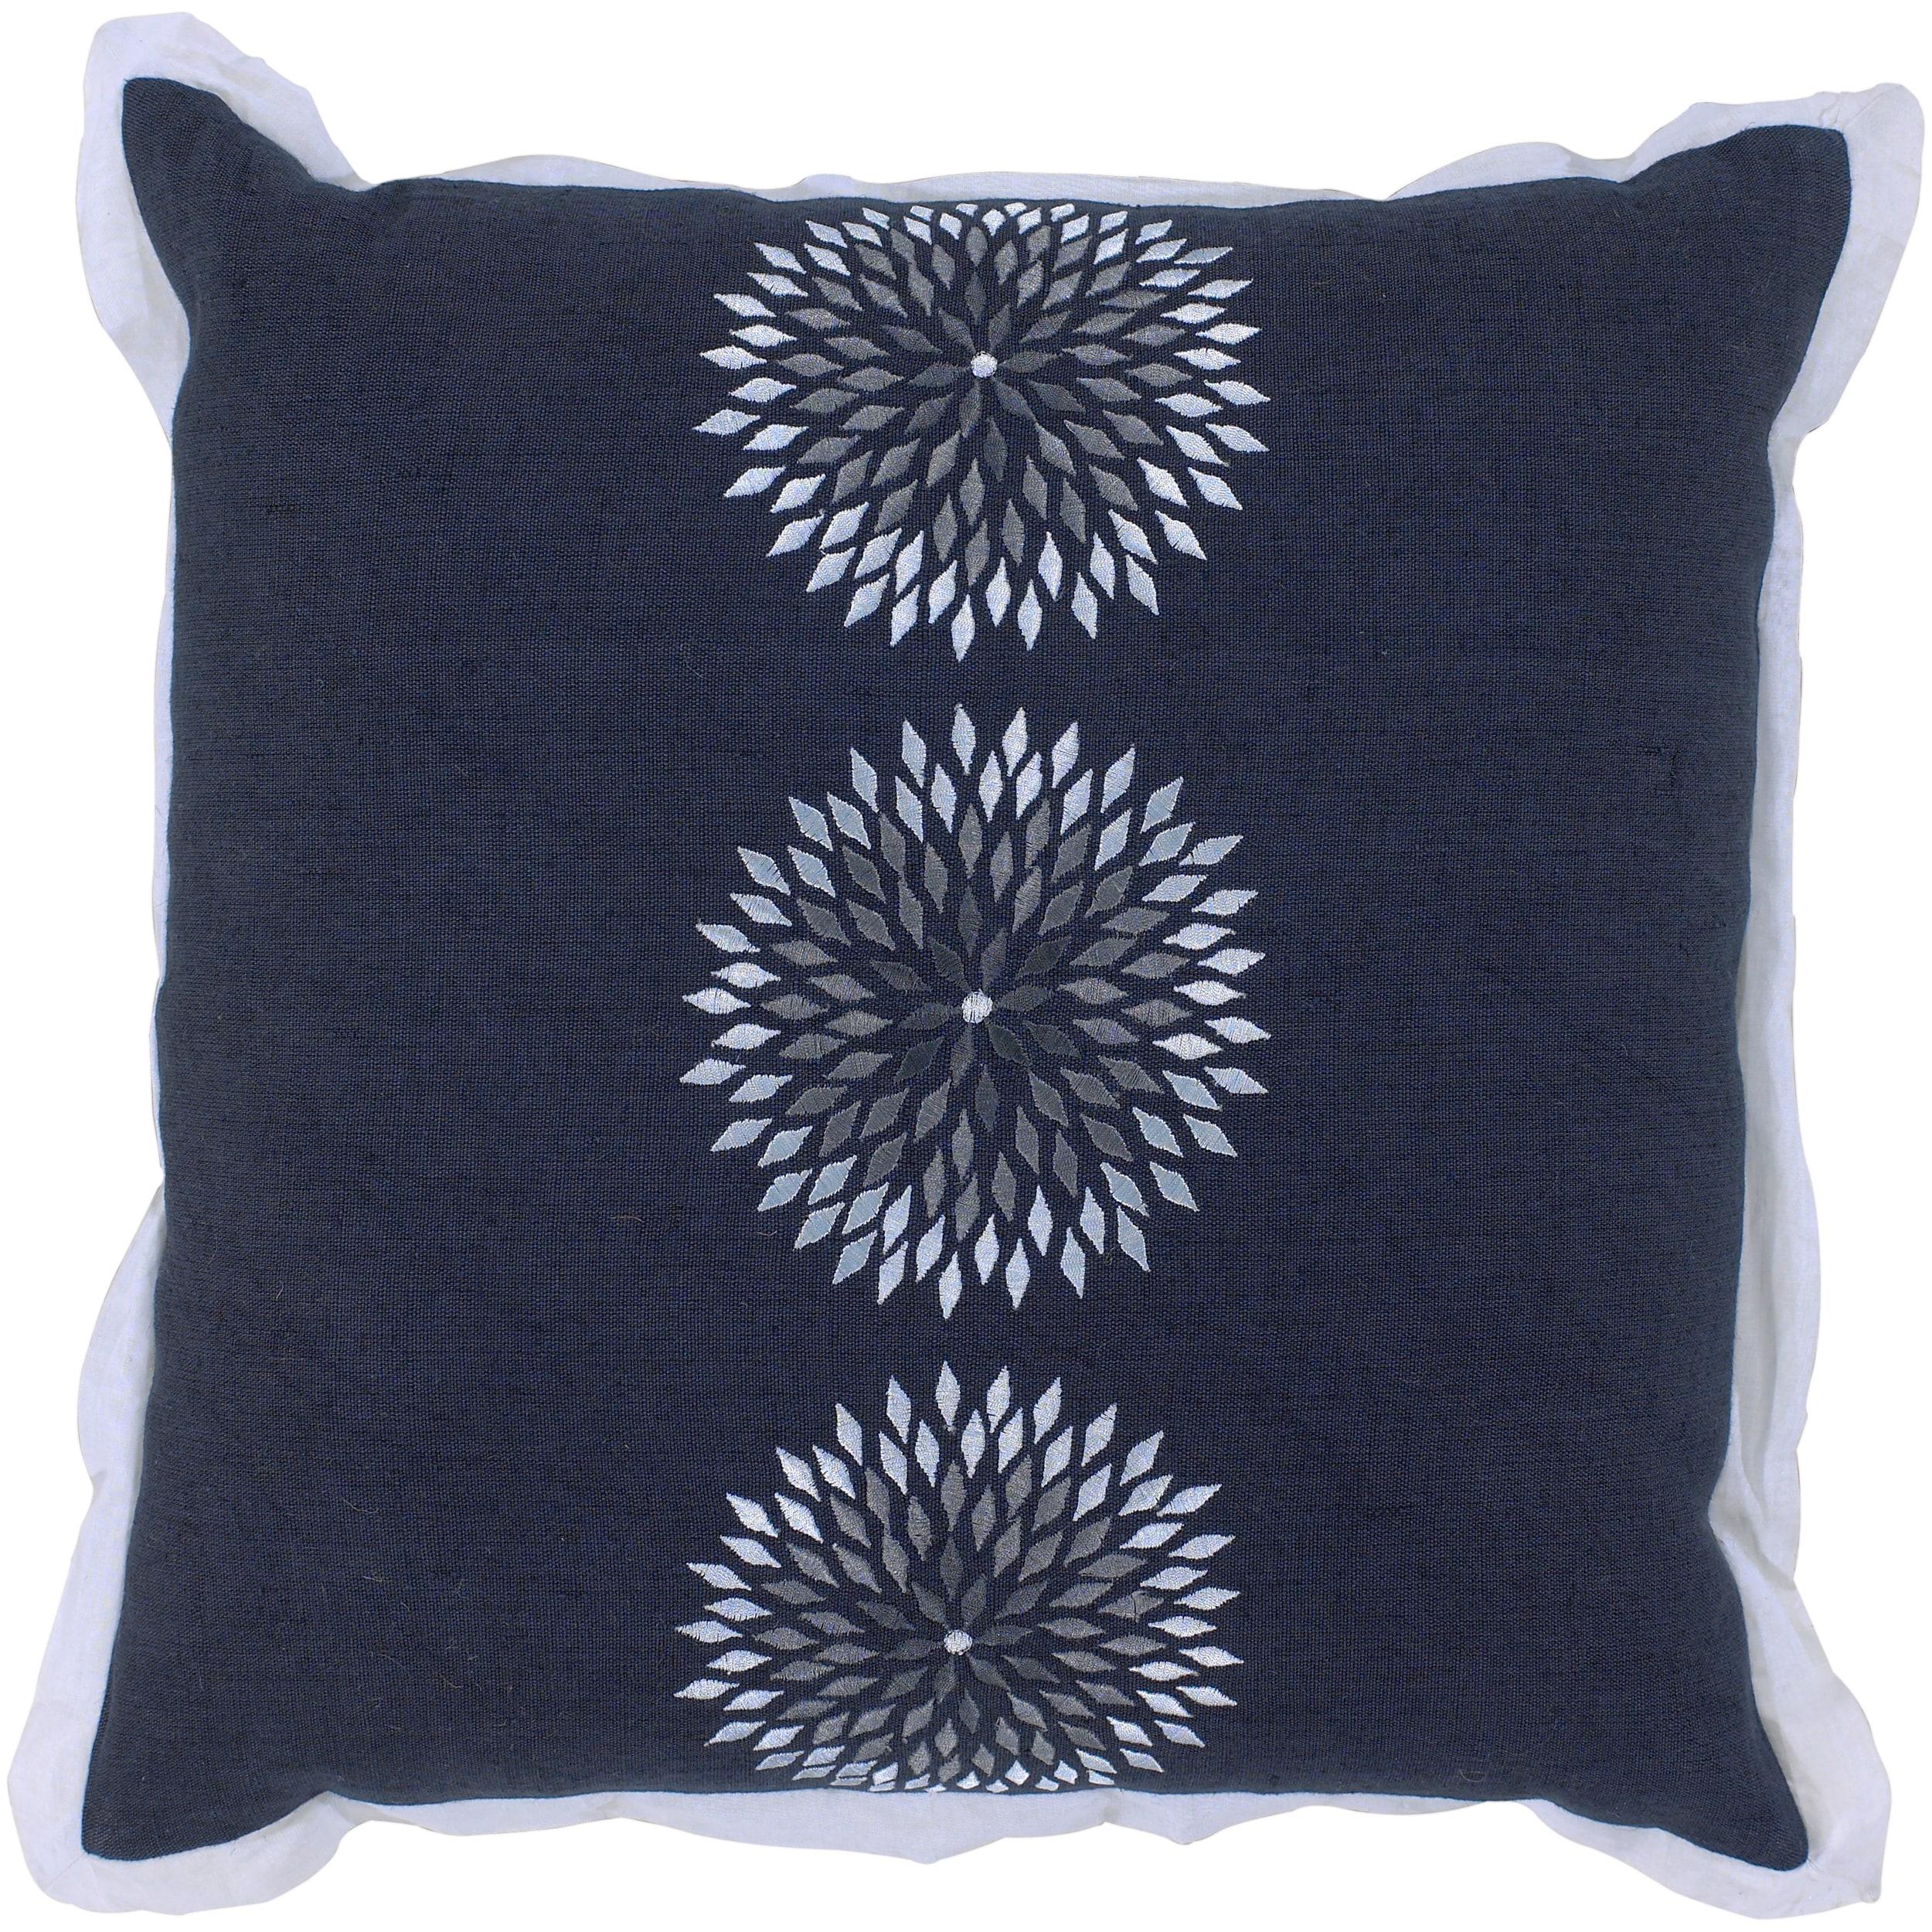 Zurich Navy Blue Floral Decorative Pillow